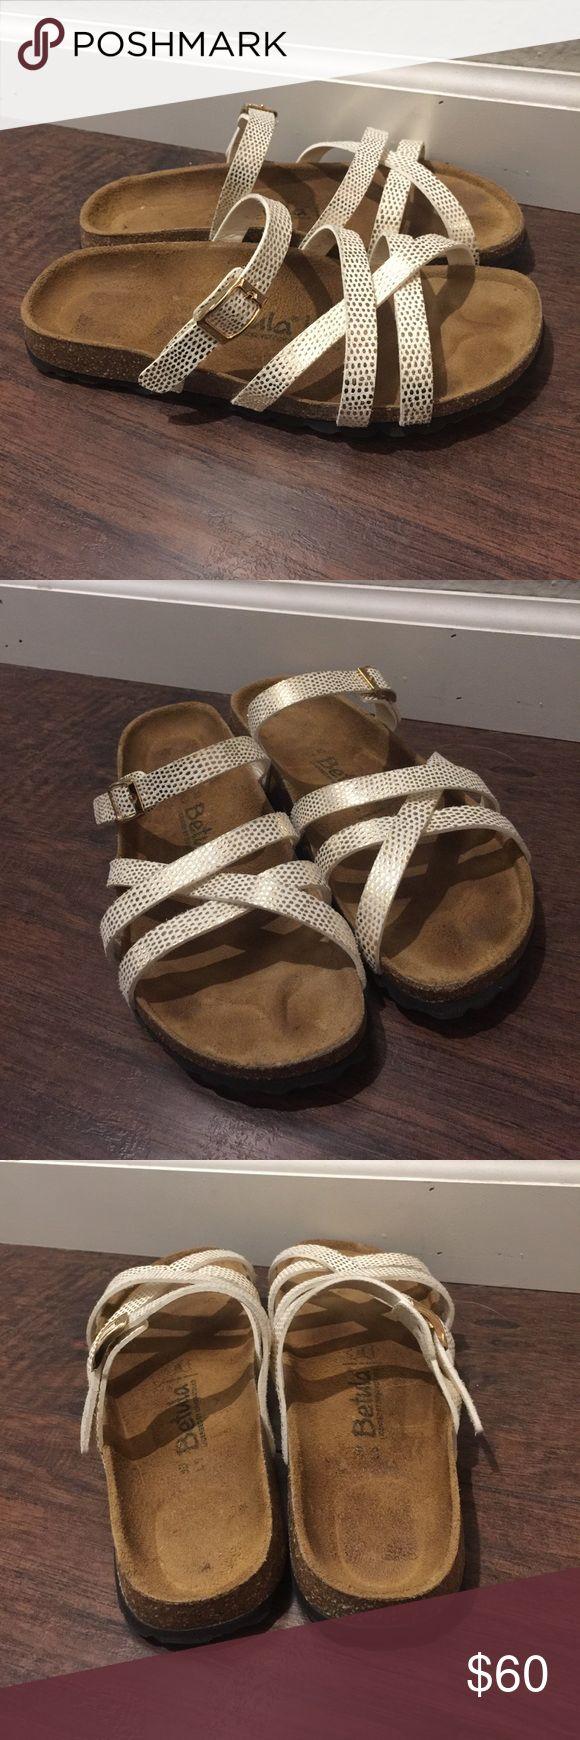 Birkenstock Betula Sandals Birkenstock Betula Polka Dot sandals size 36 Birkenstock Shoes Sandals